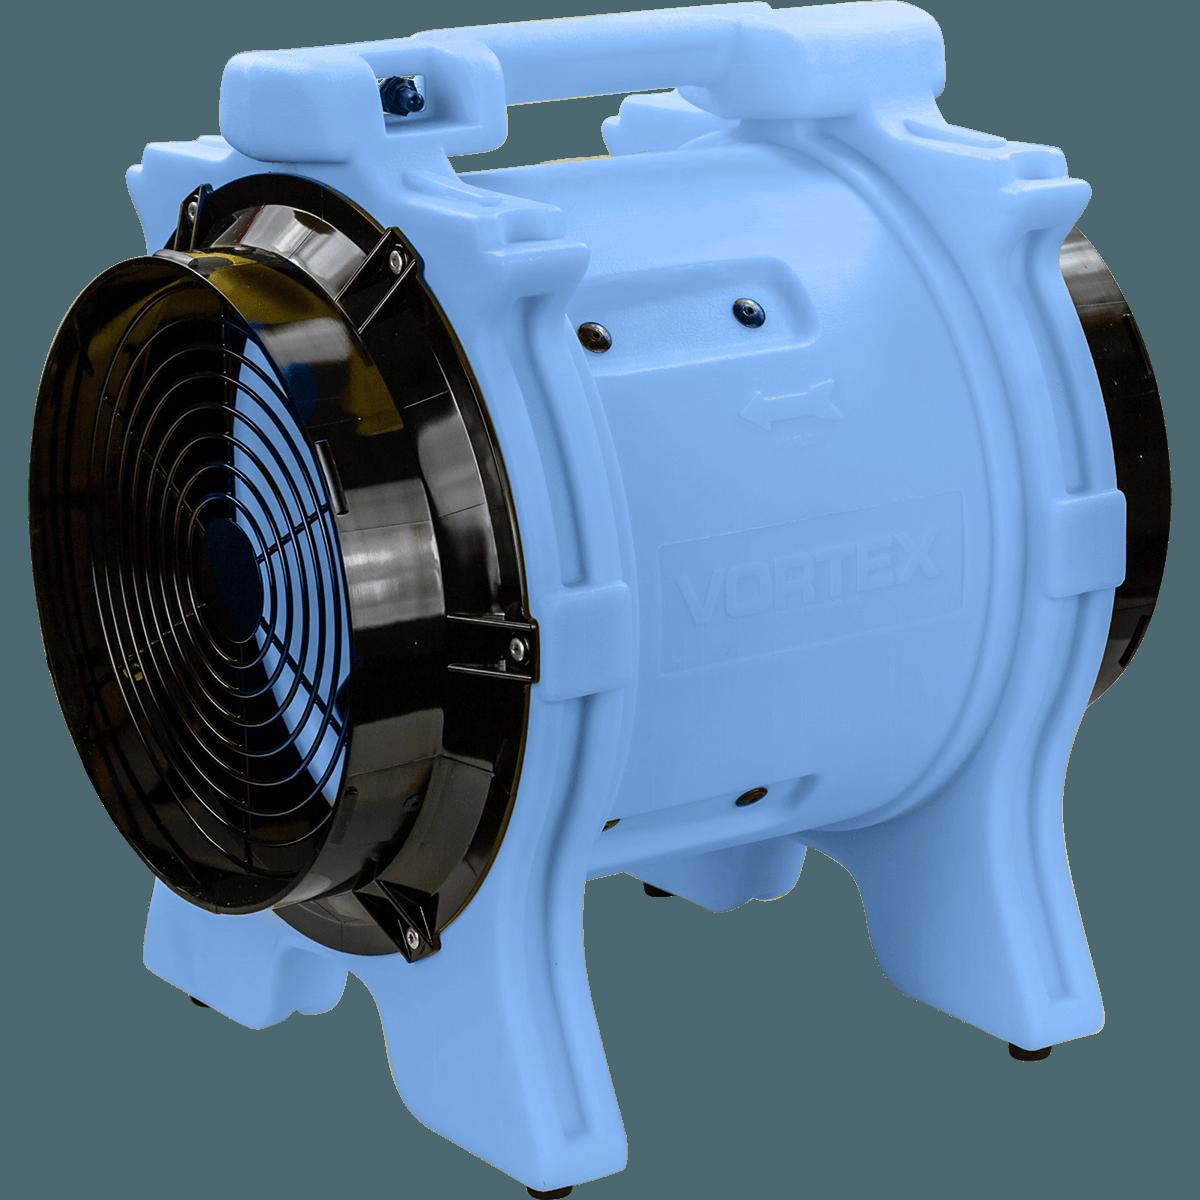 Buy Cheap DriEaz Vortex Axial Fan Blue in 2020 Axial